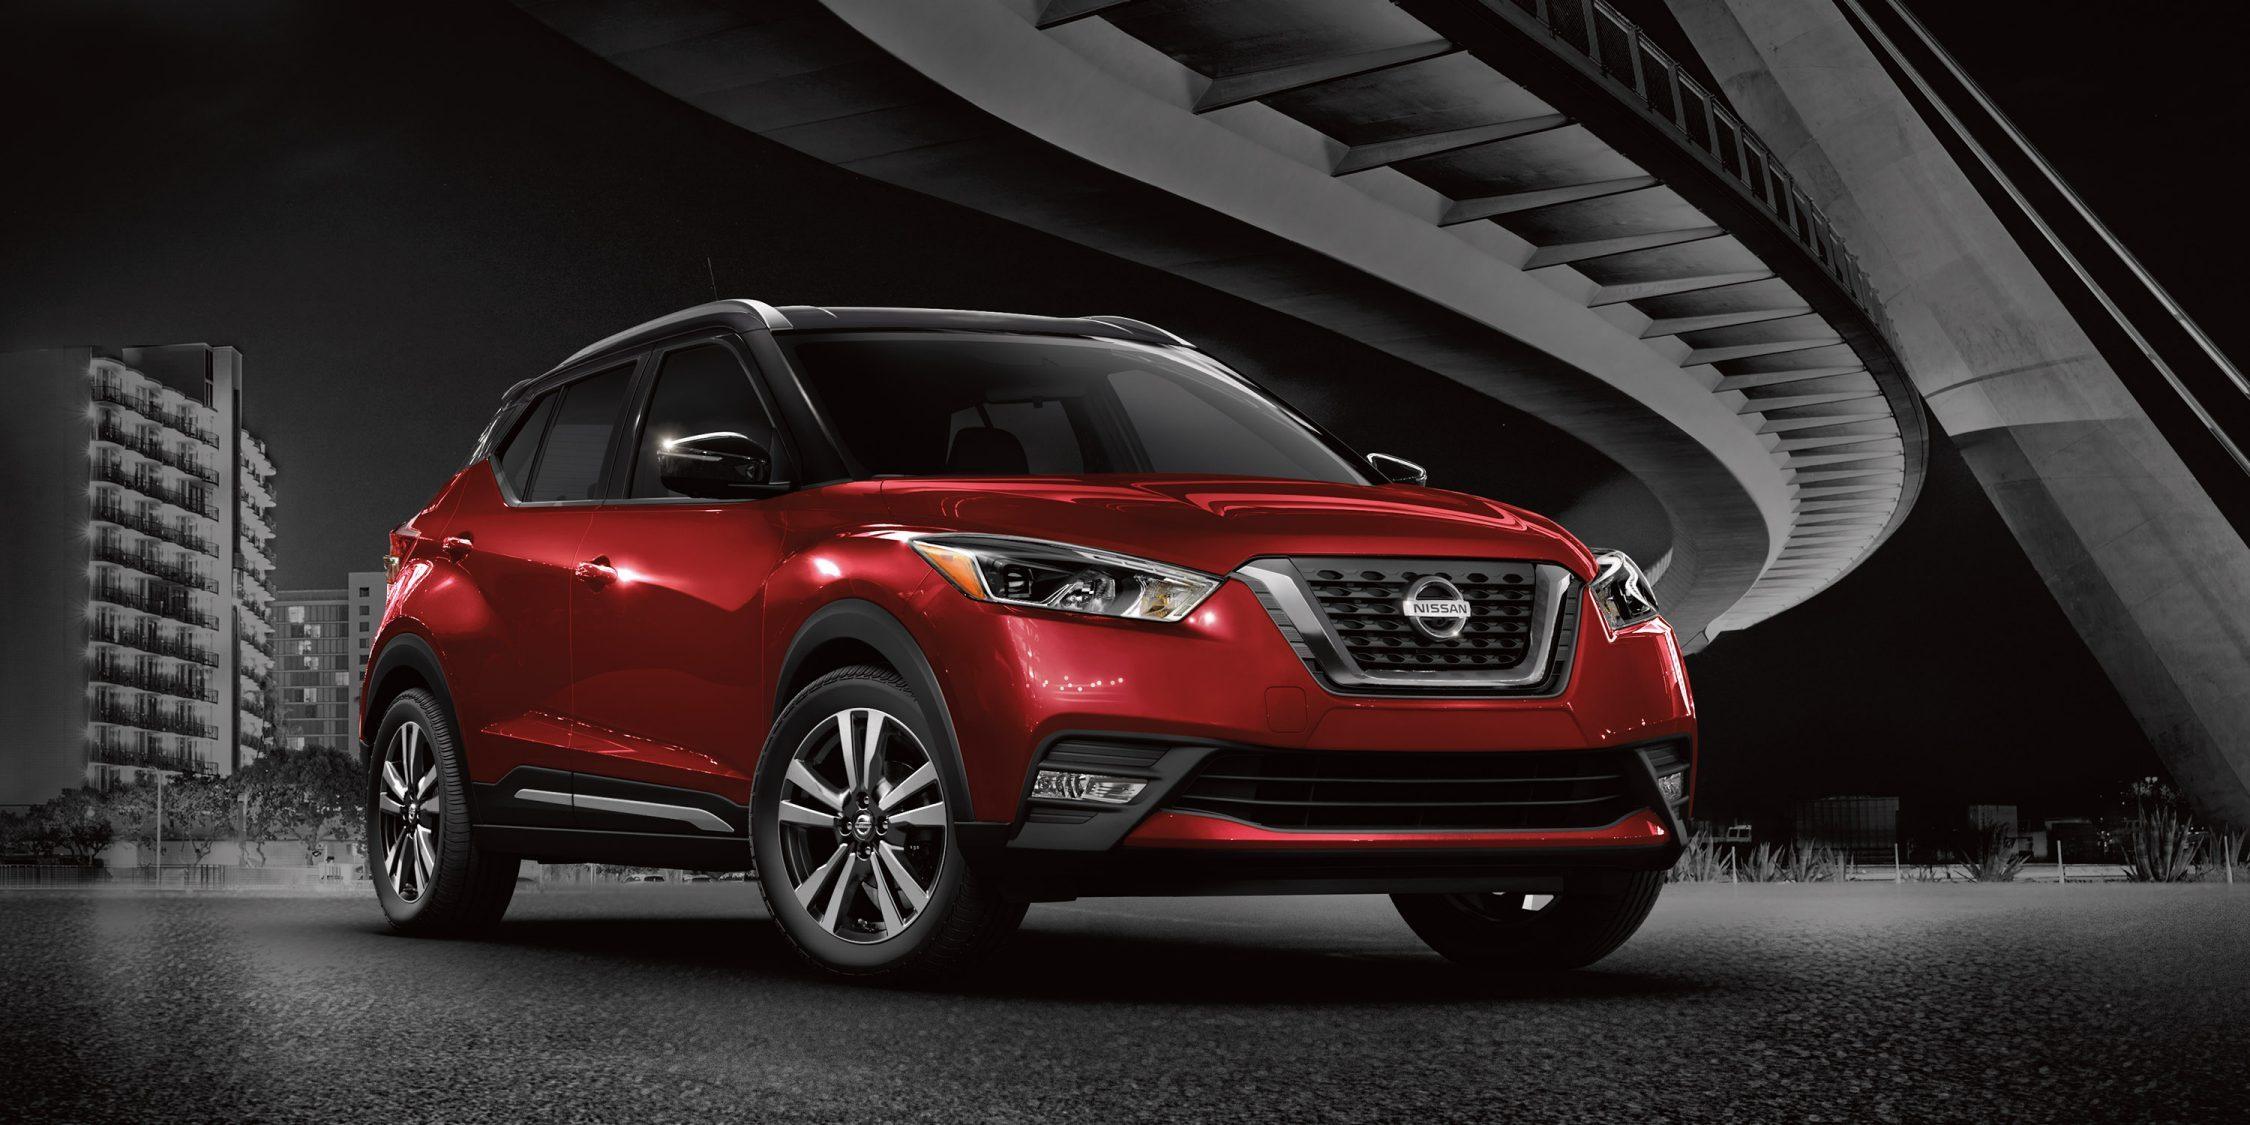 Nissan Kicks Price & Lease fers Jeff Wyler